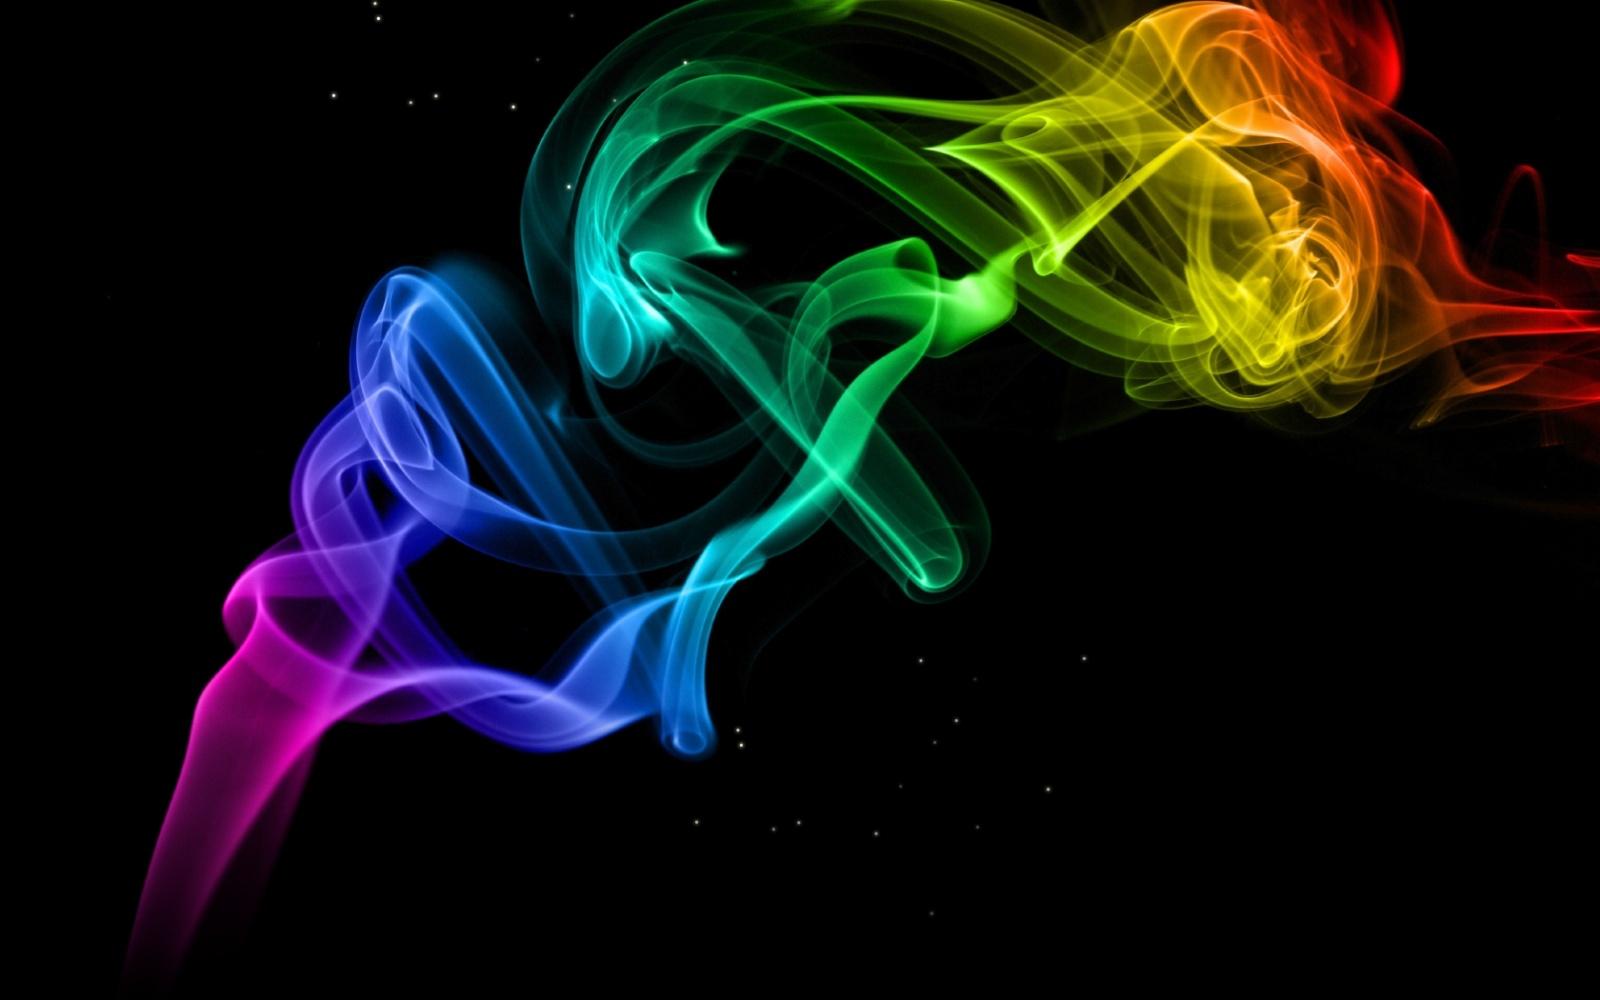 Colorful Smoke Wallpapers   8426 1600x1000